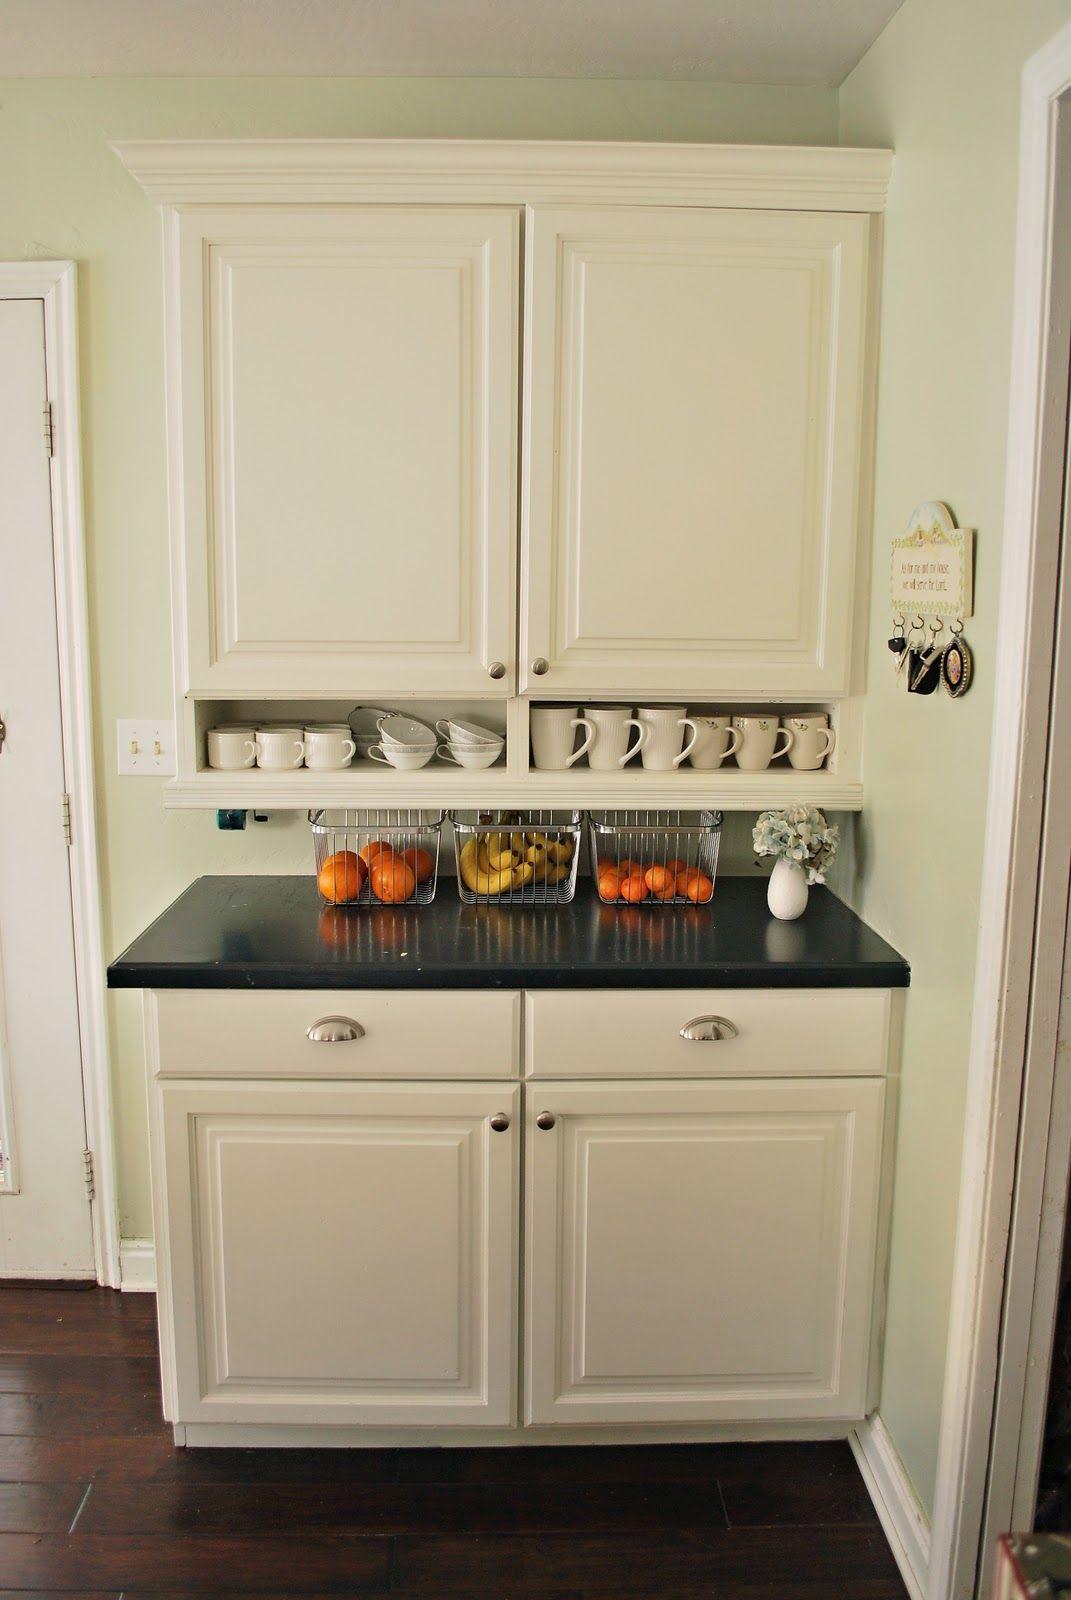 Kitchen20108 Jpg 1 071 1 600 Pixels Home Kitchens Home Kitchen Remodel